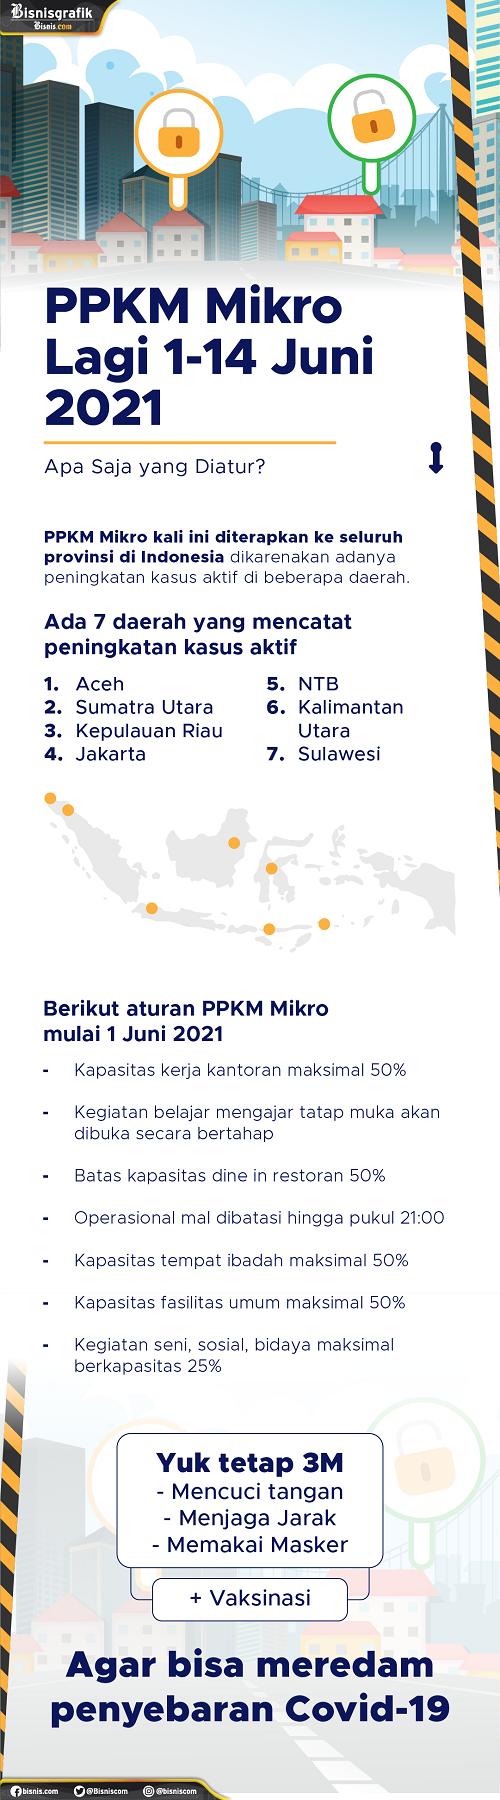 Gambar: Infografis